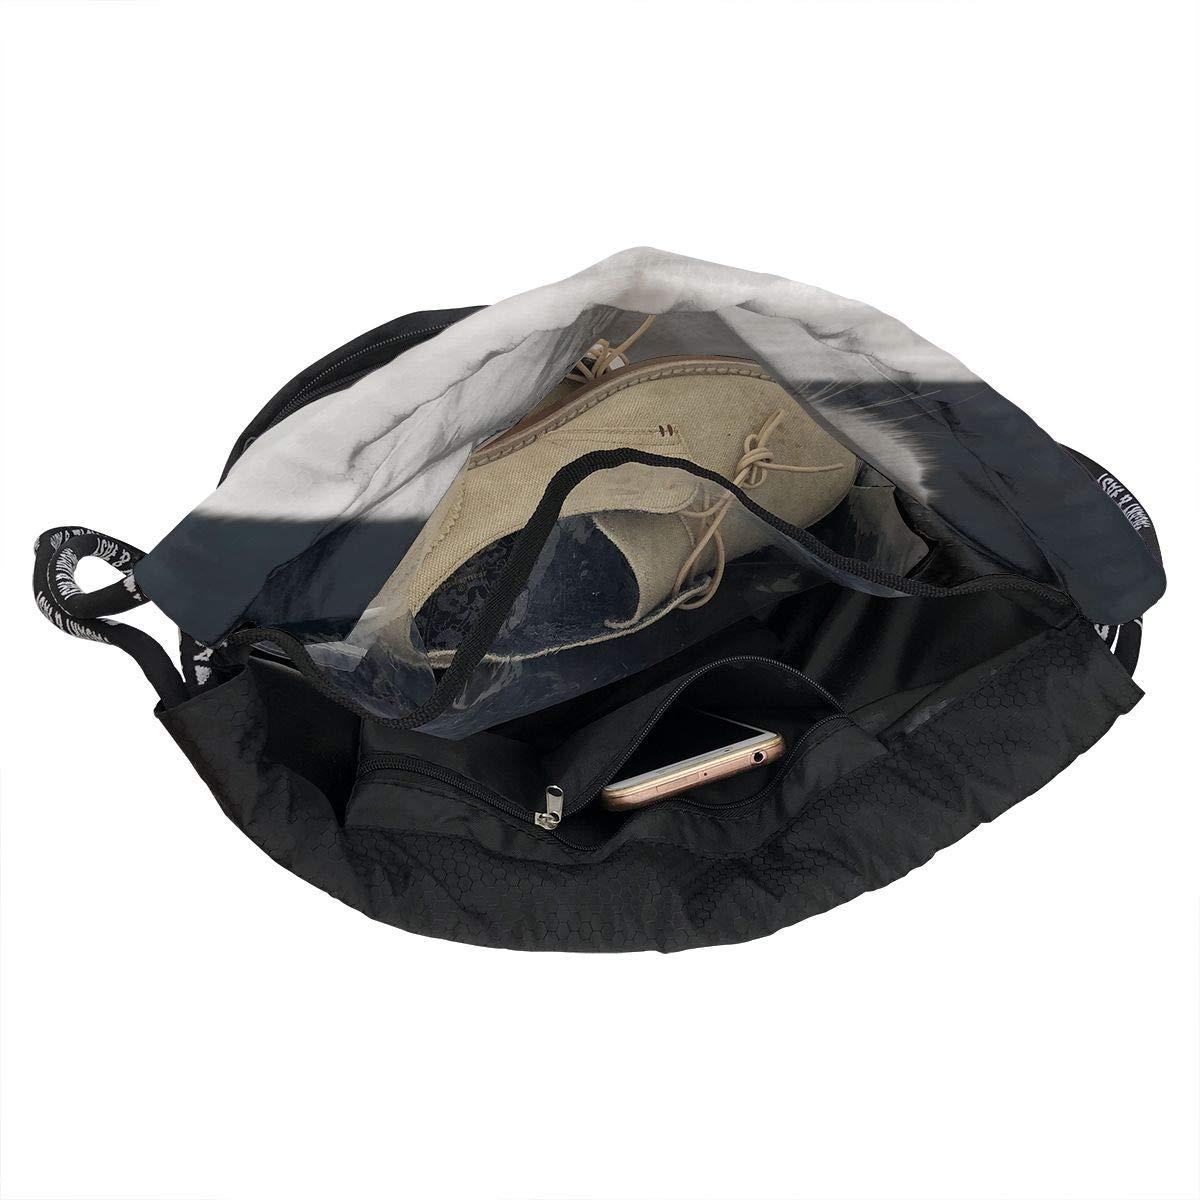 Zol1Q Lightweight Waterproof Large Storage Drawstring Bag for Men /& Women White Cat Cinch Backpack Sackpack Tote Sack